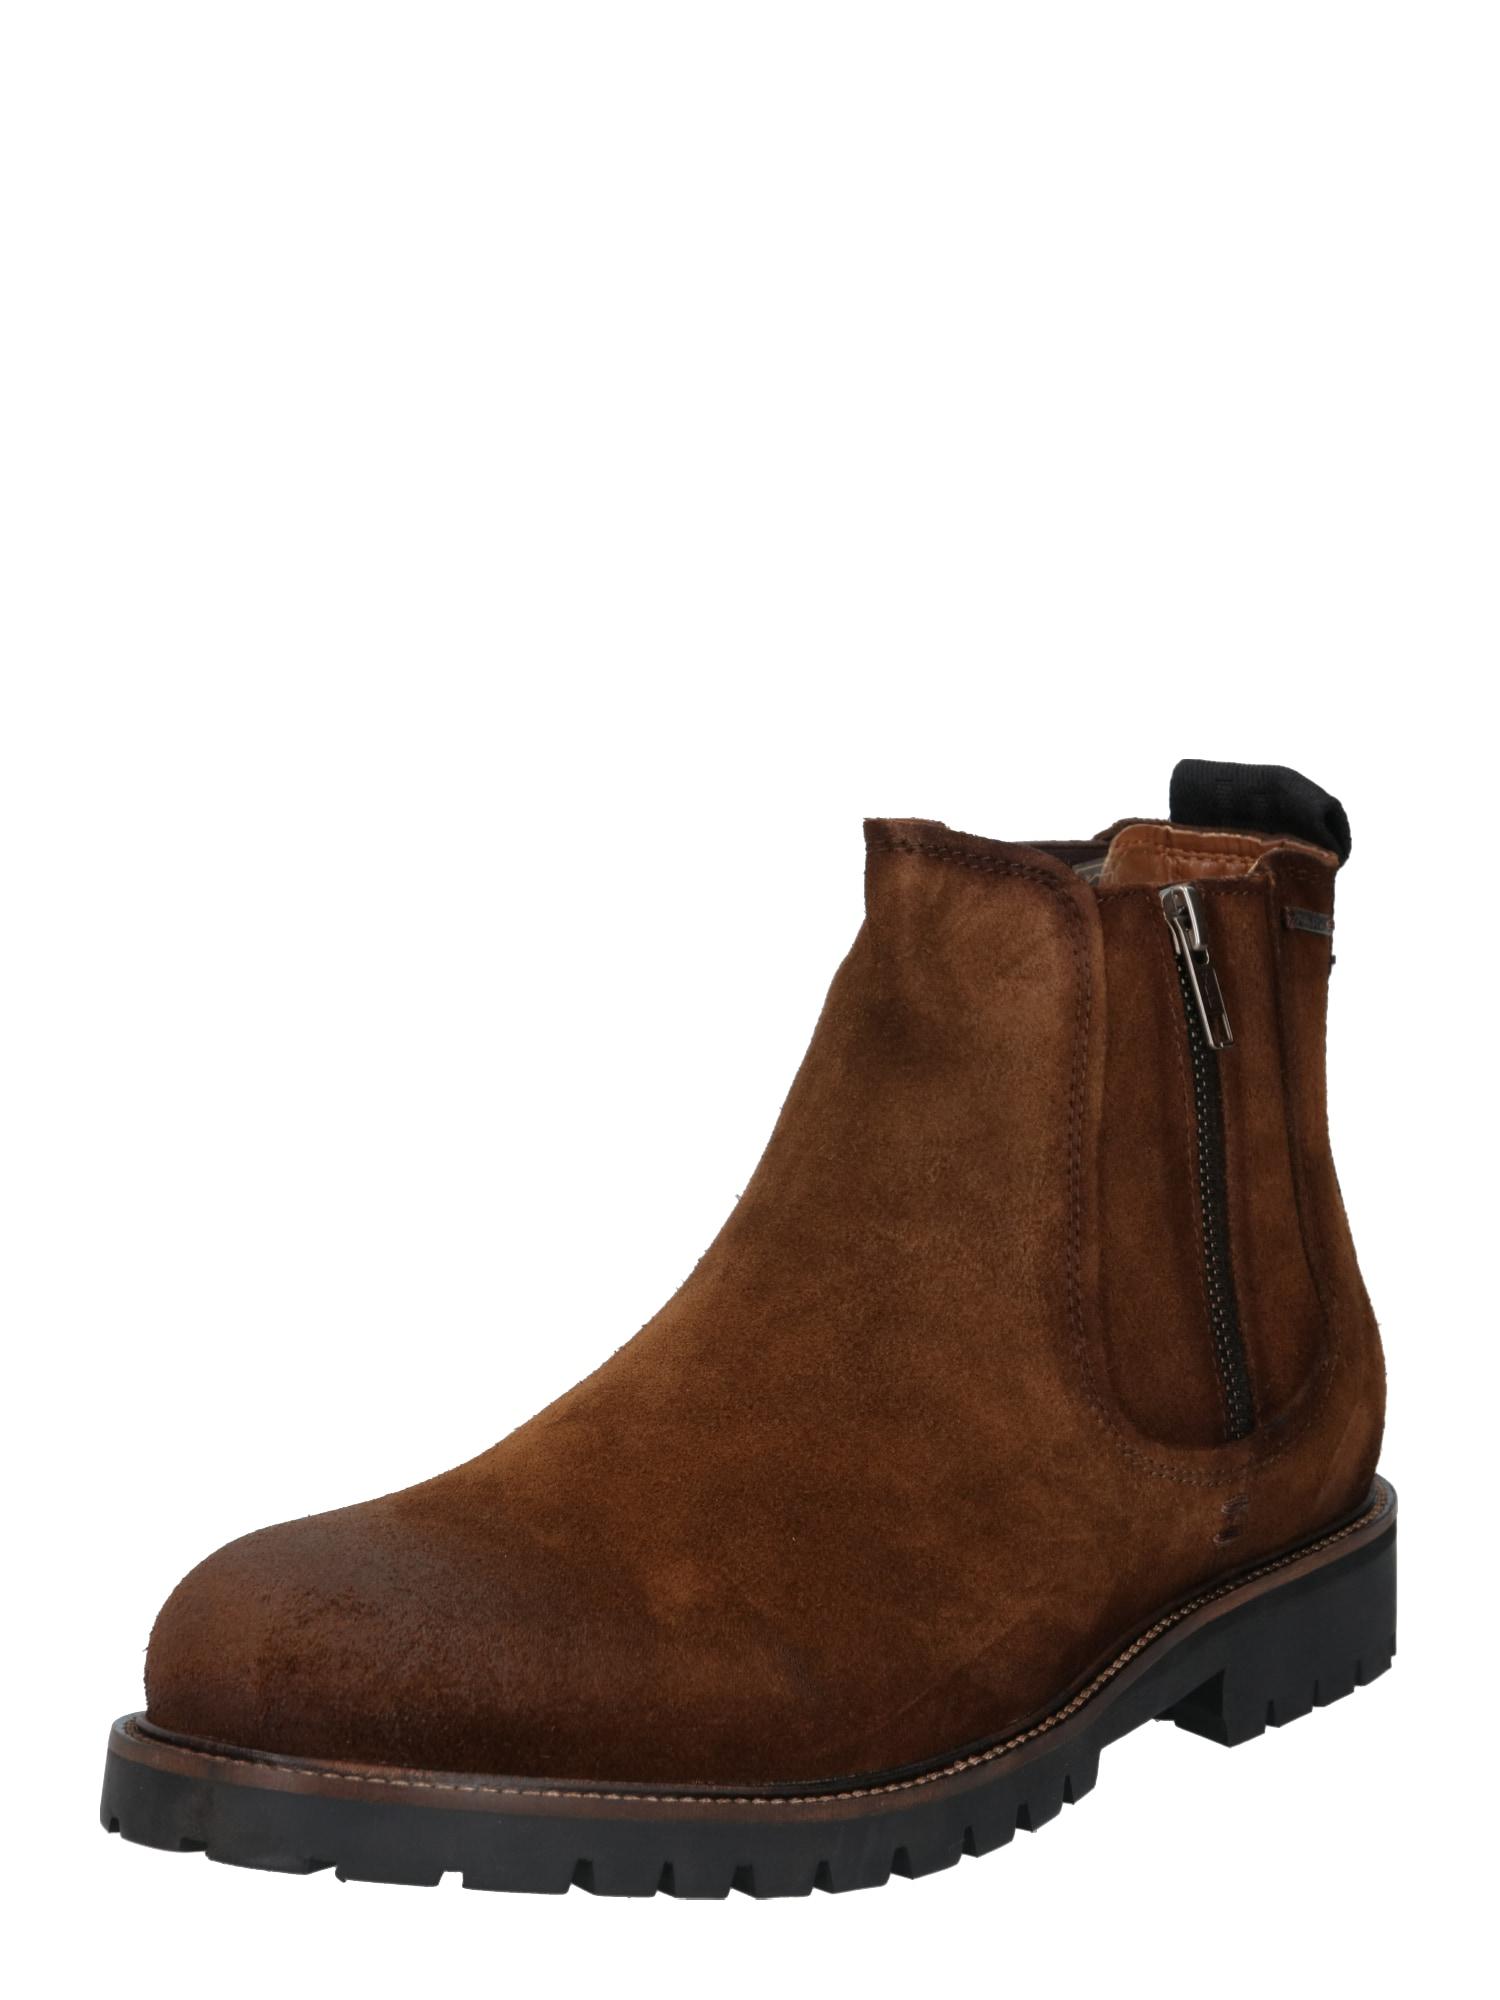 "Pepe Jeans ""Chelsea"" batai karamelės / tamsiai ruda / juoda"